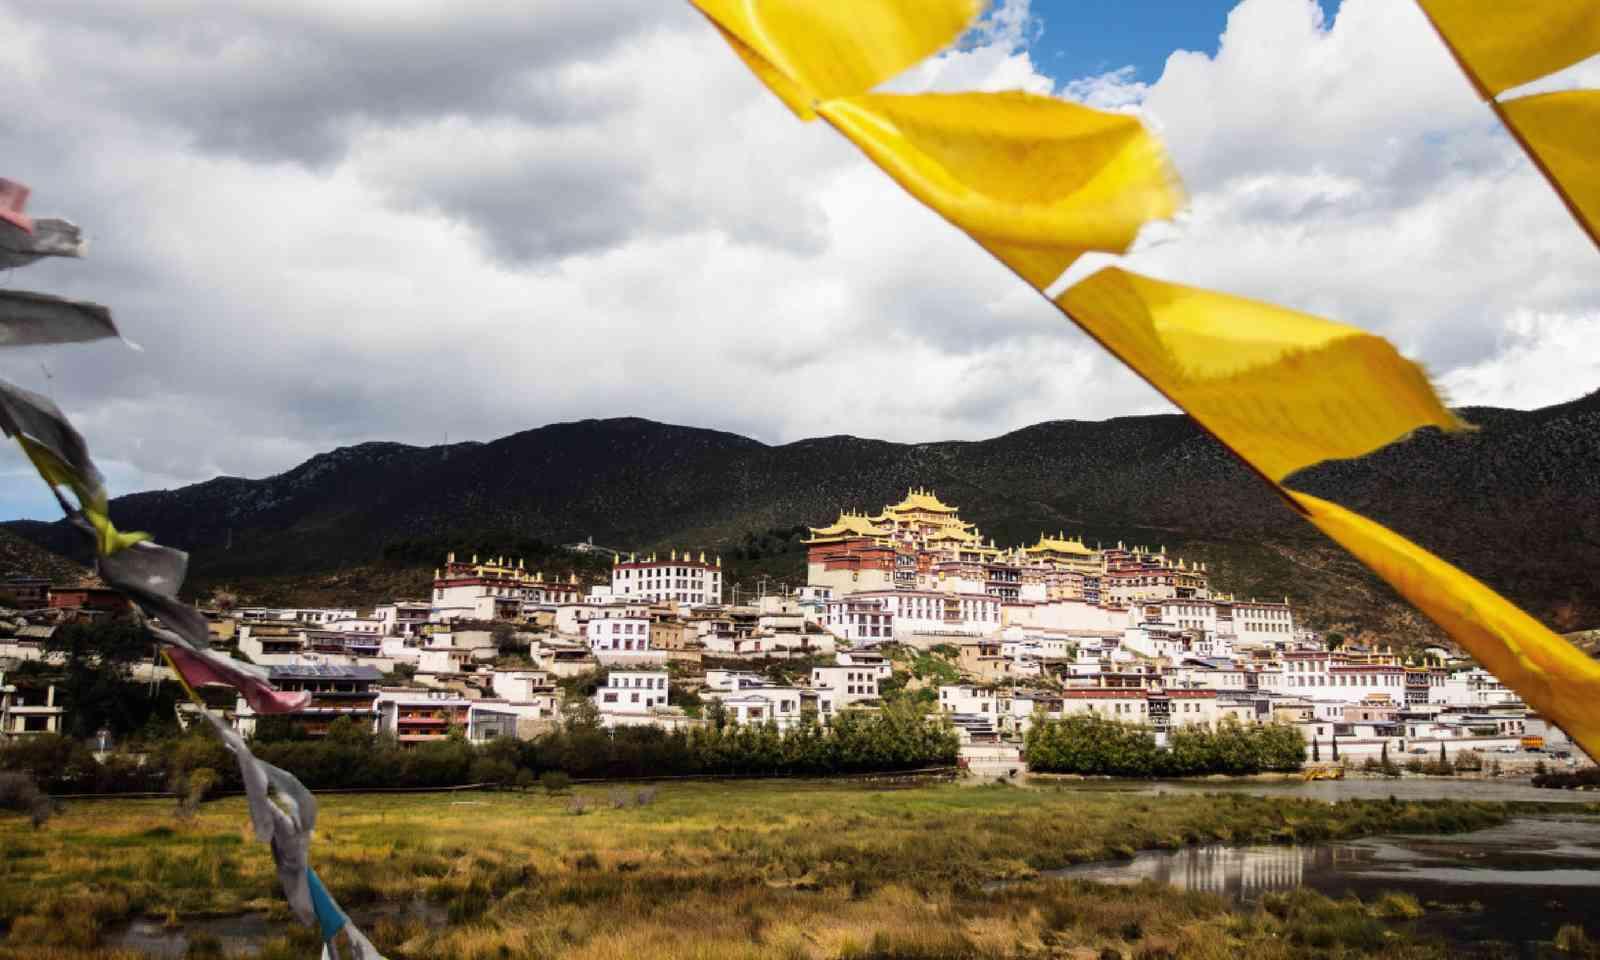 The 17th-century Ganden Sumtsenling Monastery, Yunnan (David Abram)